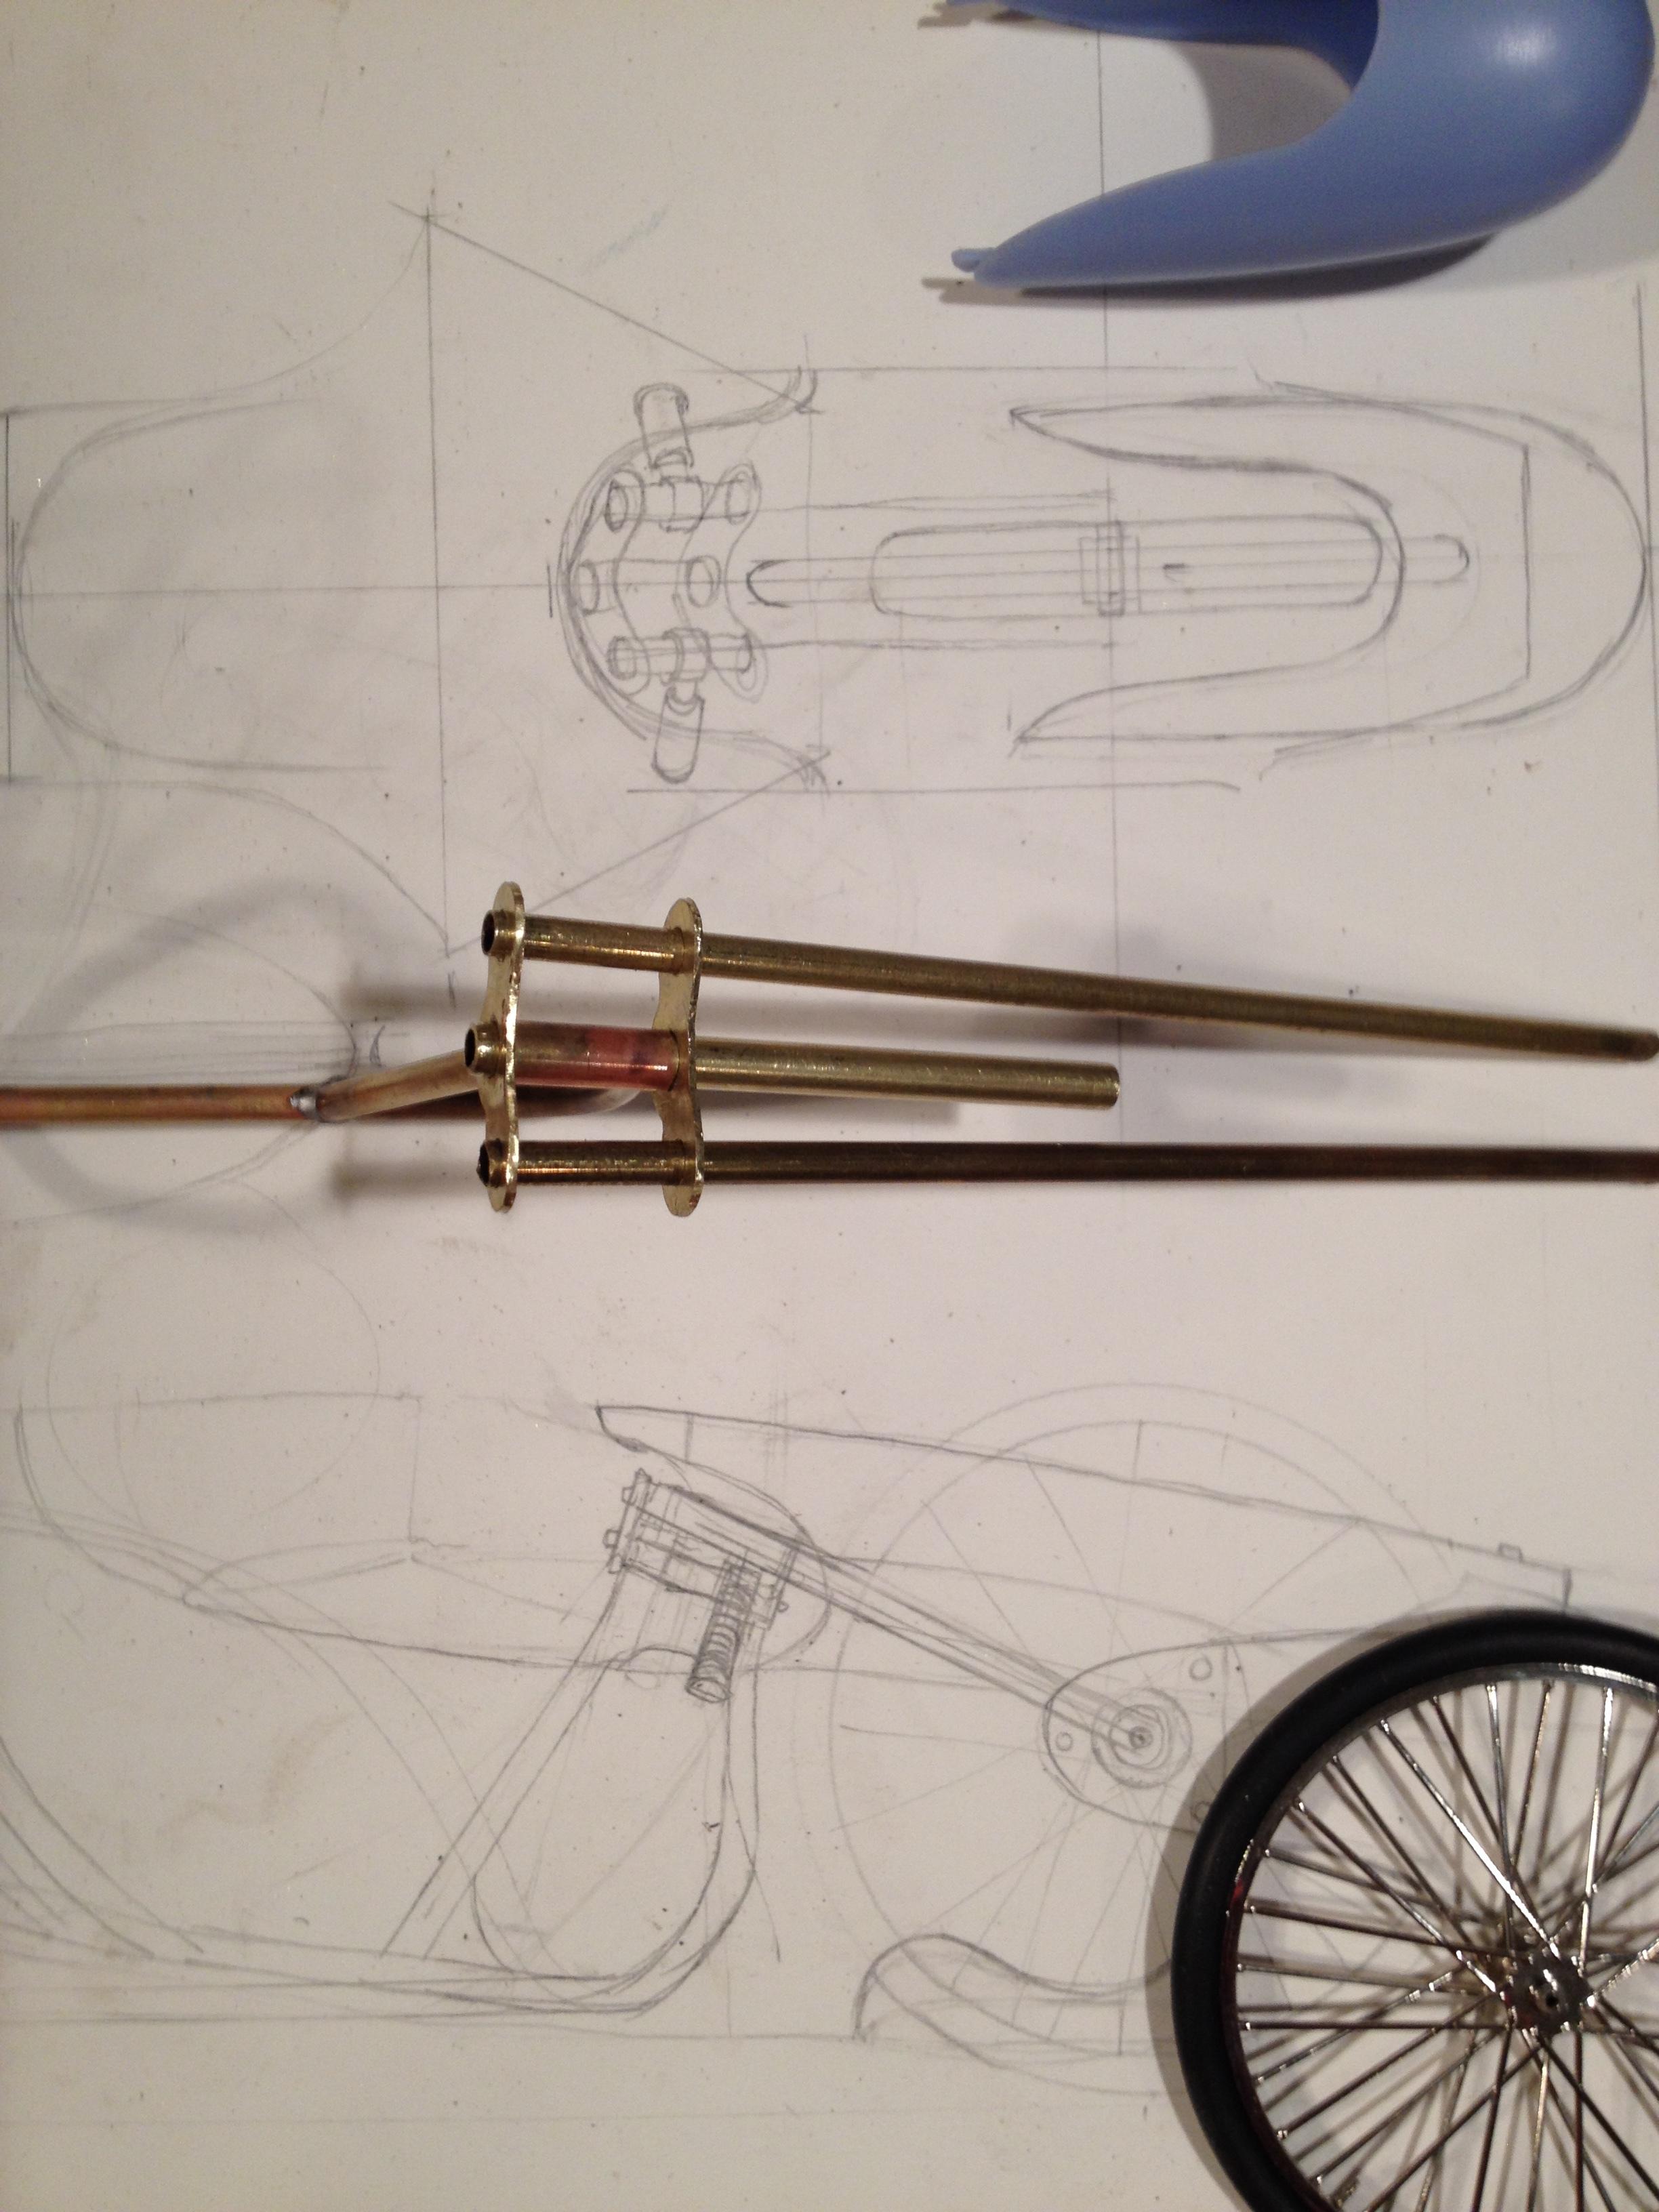 soldering the front fork